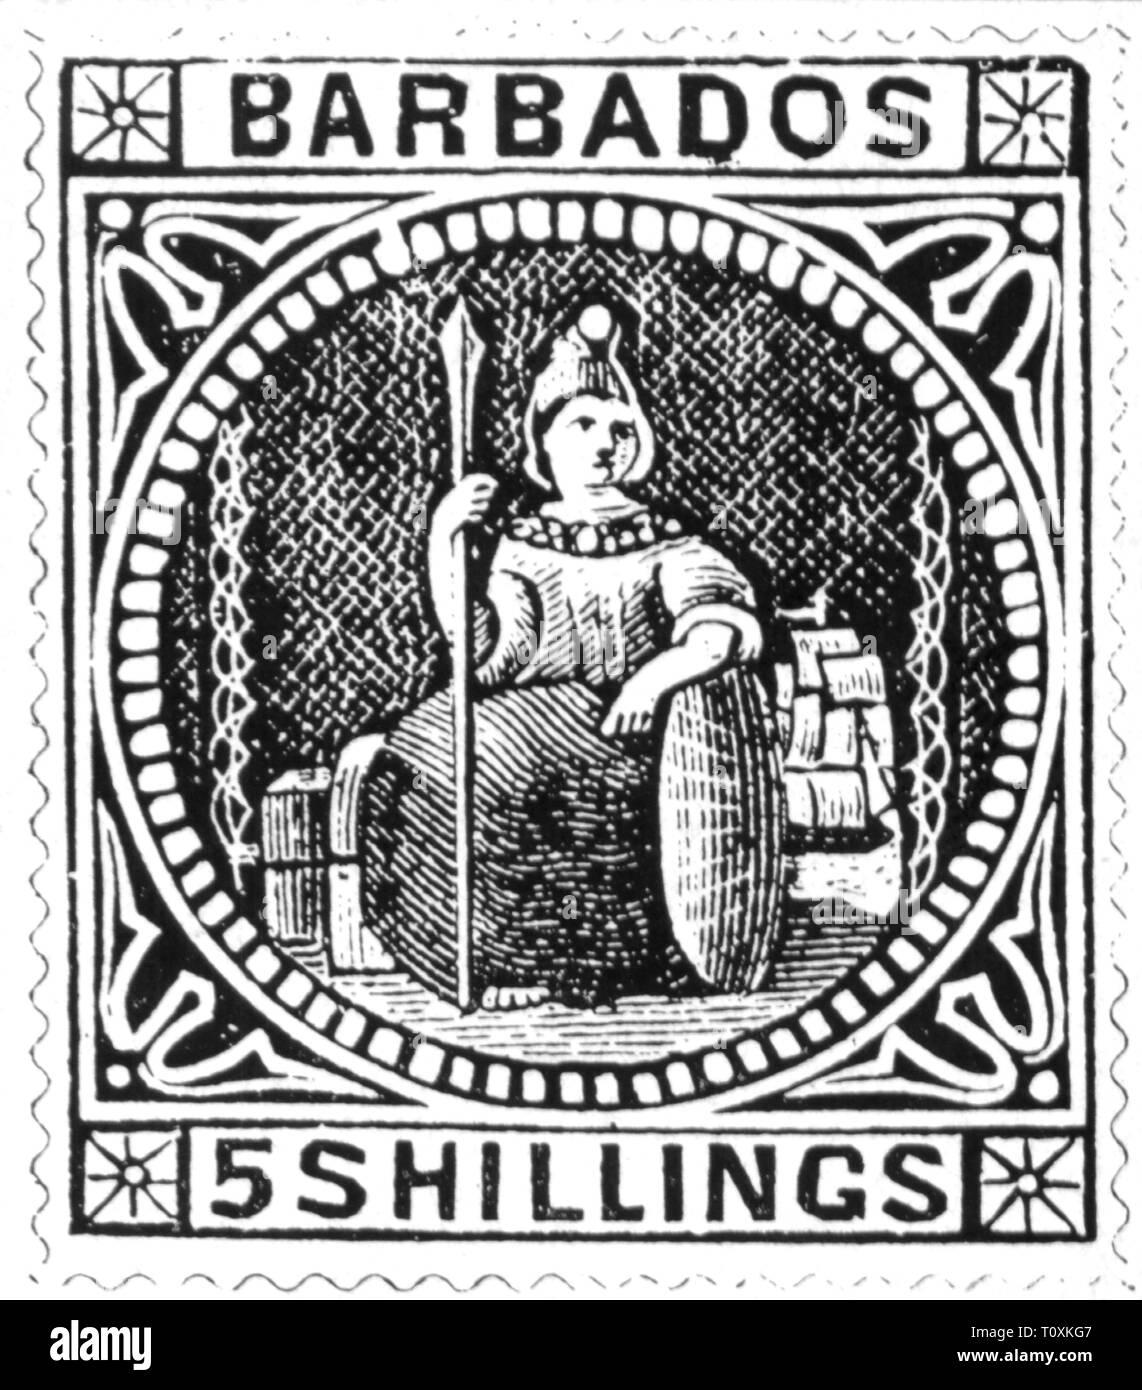 Mail, francobolli, Barbados, 5 scellino francobollo, Britannia, 1873, Additional-Rights-Clearance-Info-Not-Available Immagini Stock